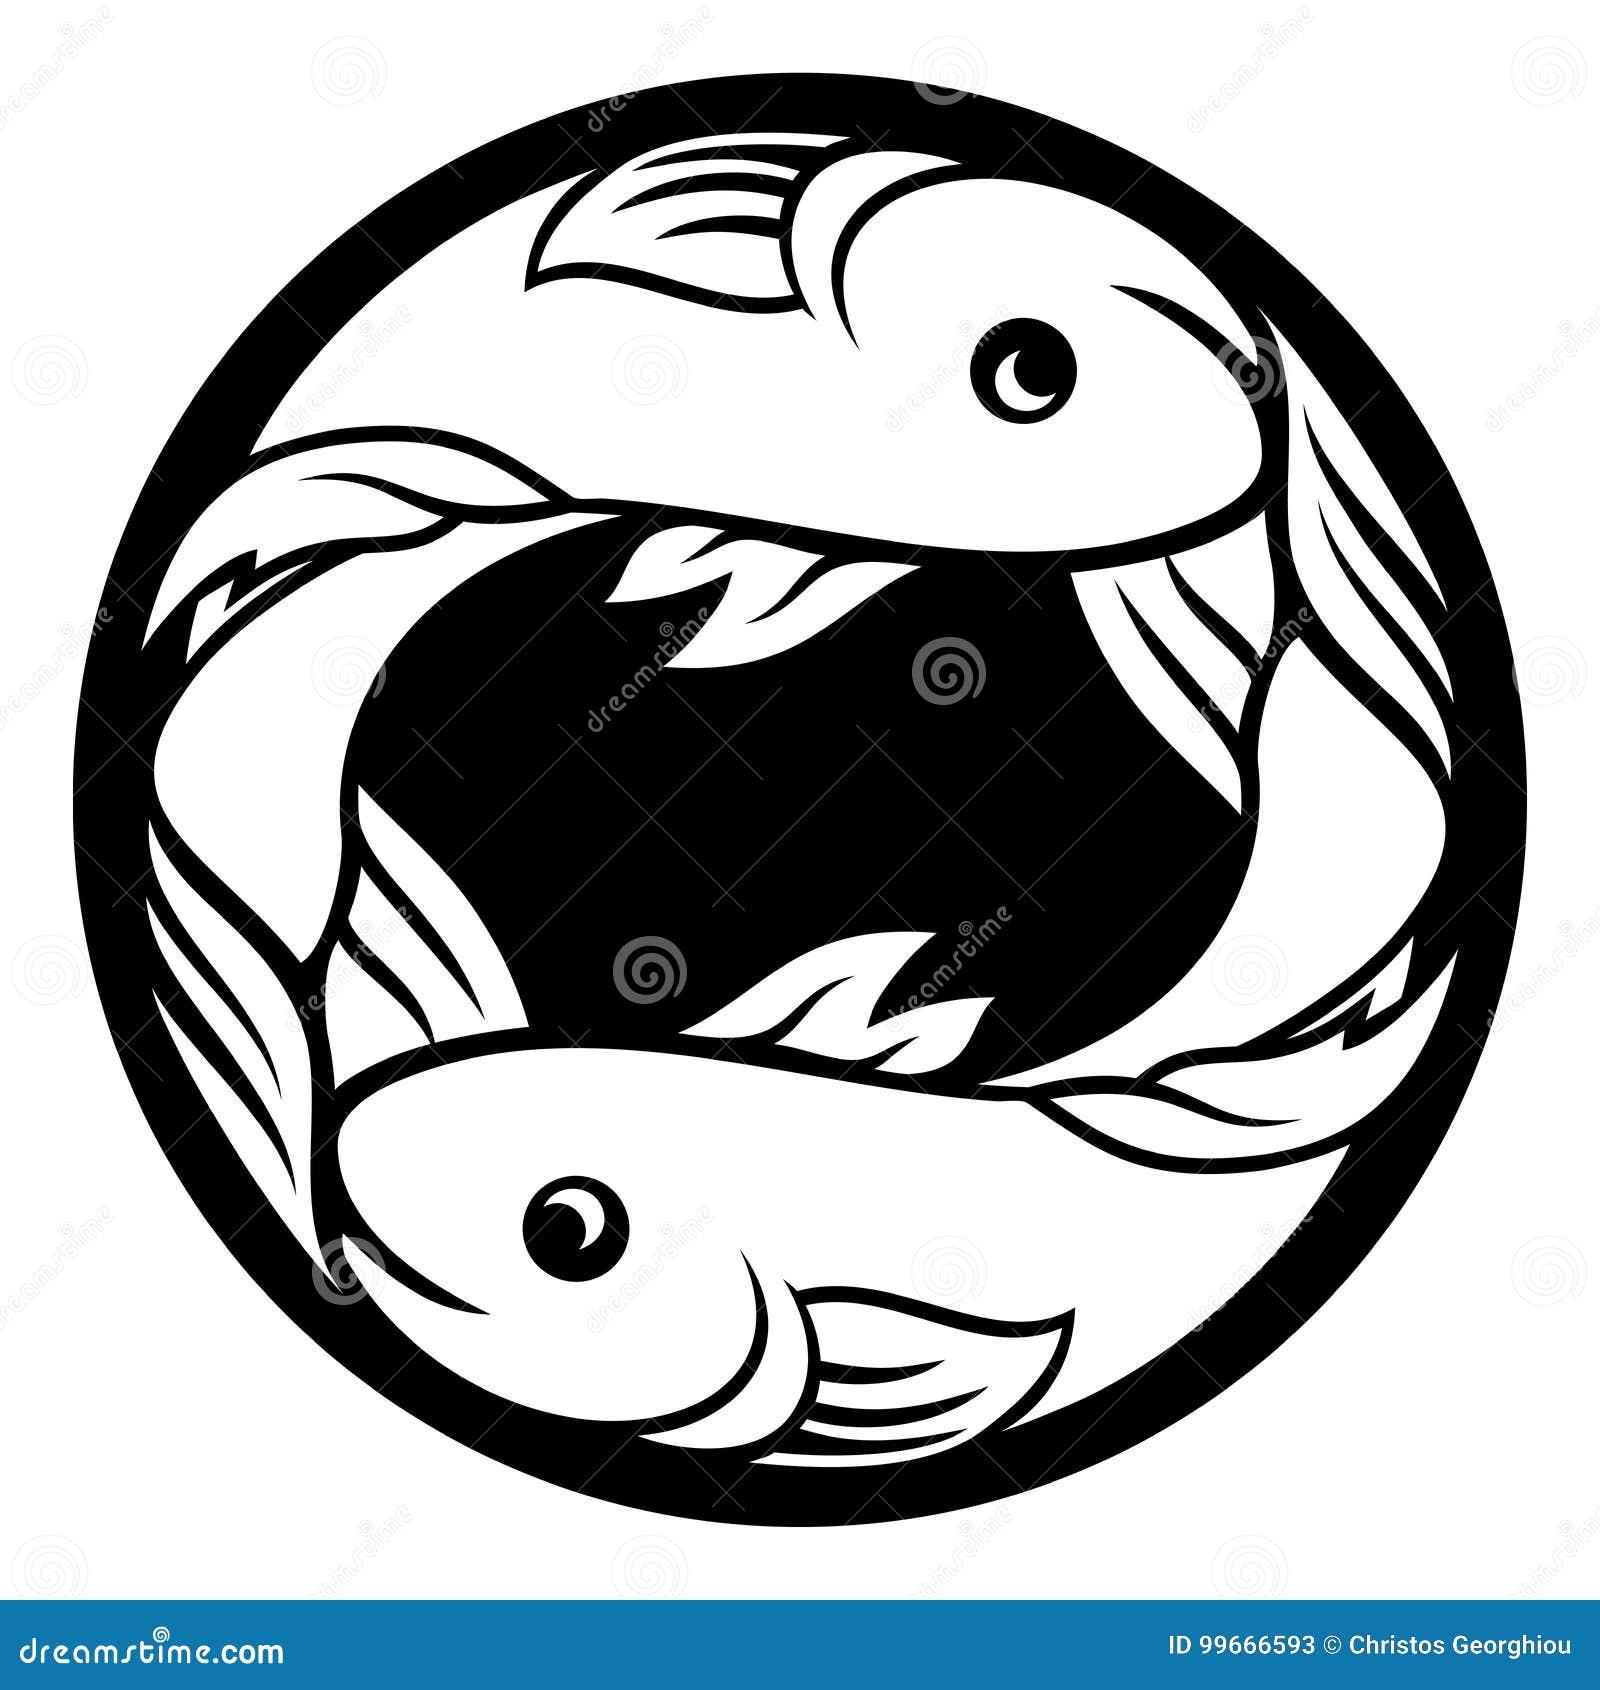 Pisces Fish Zodiac Horoscope Astrology Sign Stock Vector